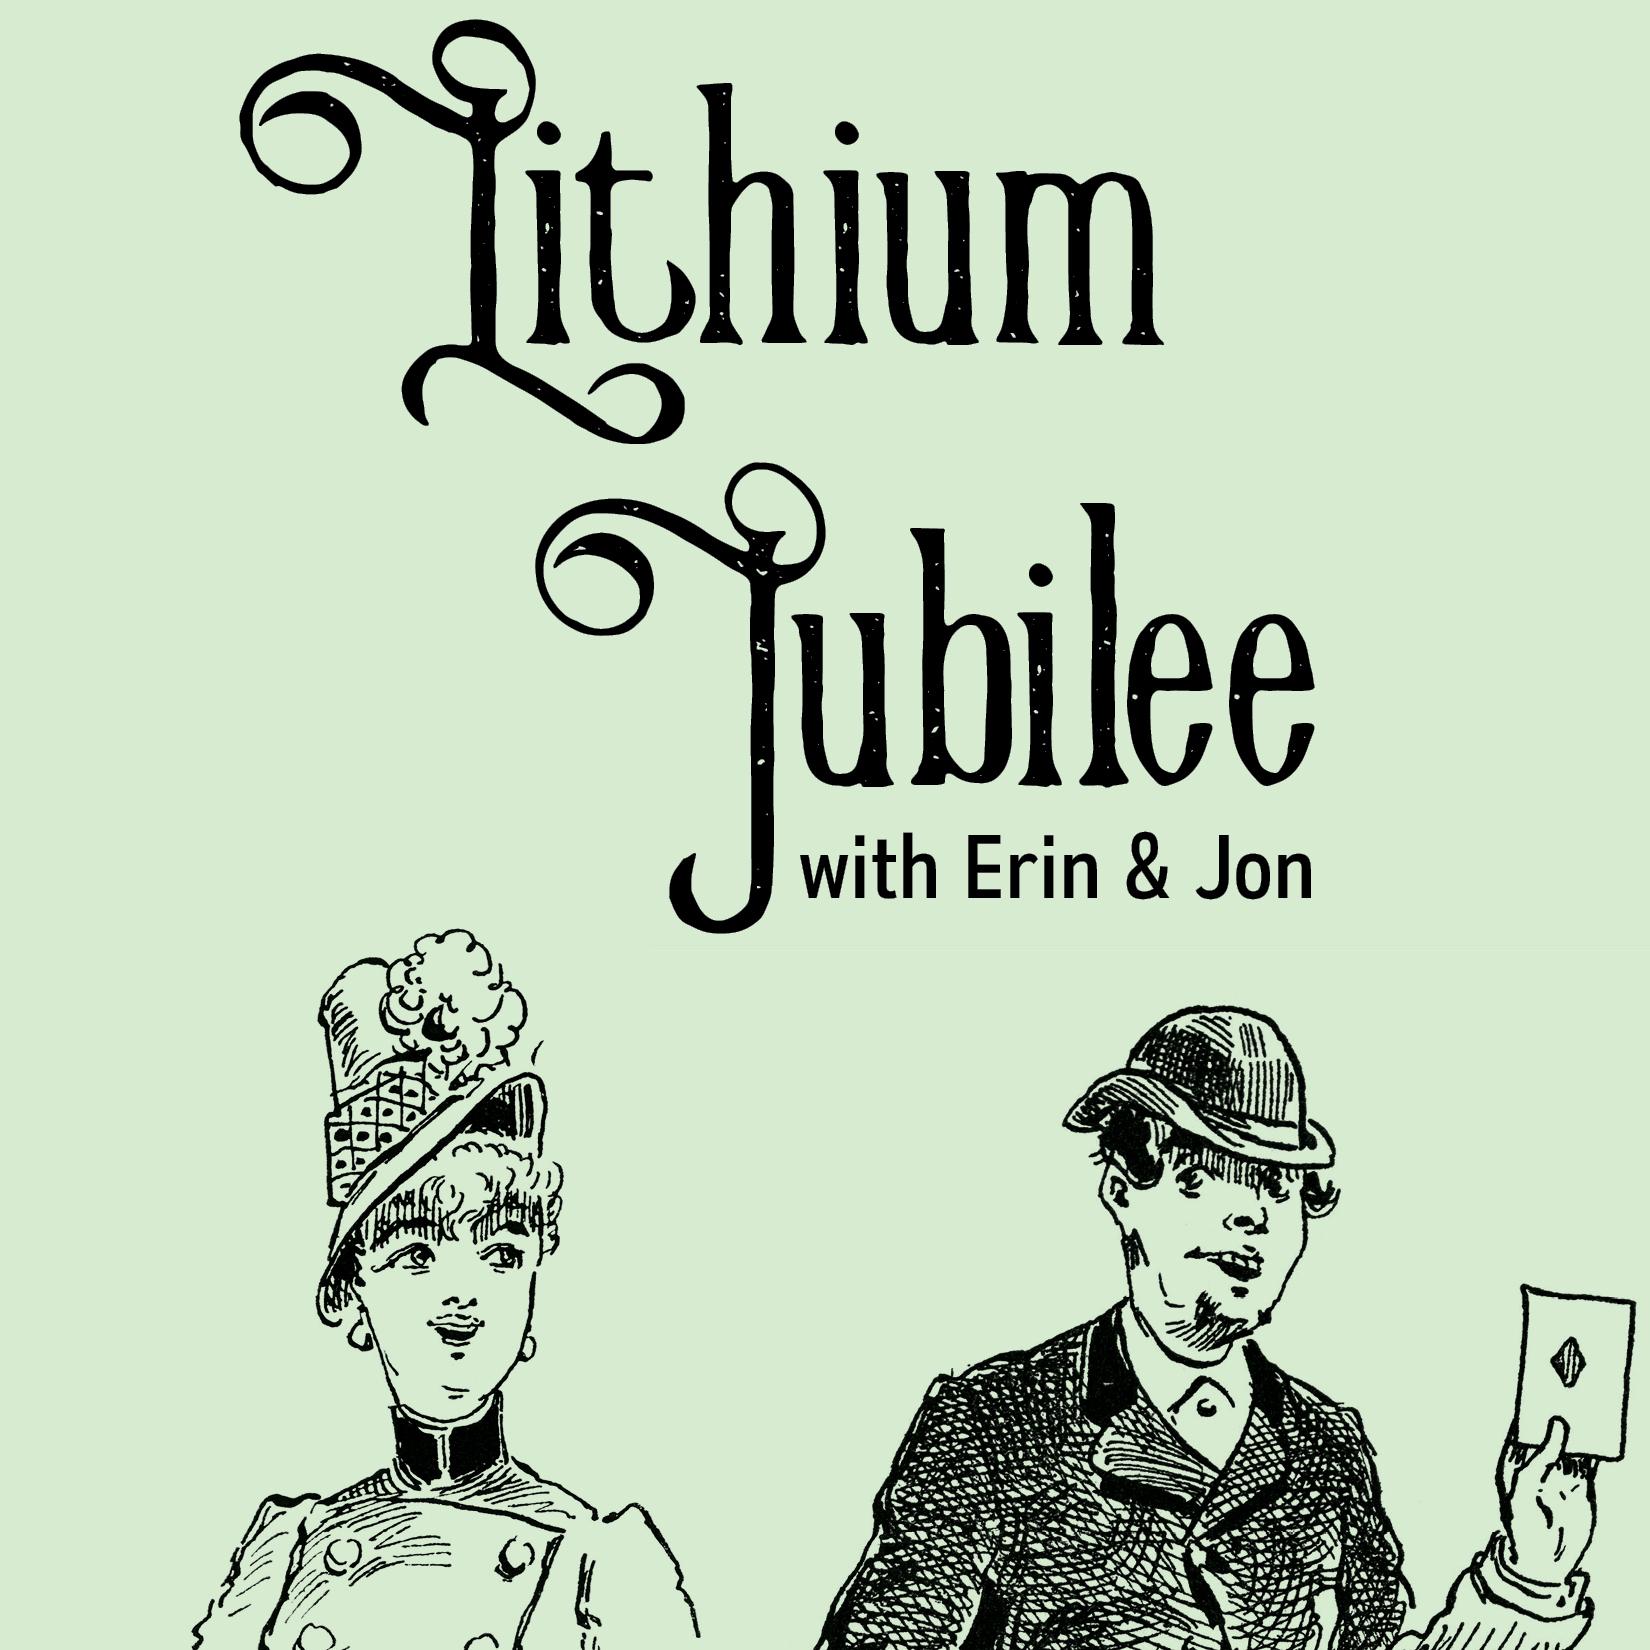 Lithium Jubilee show art